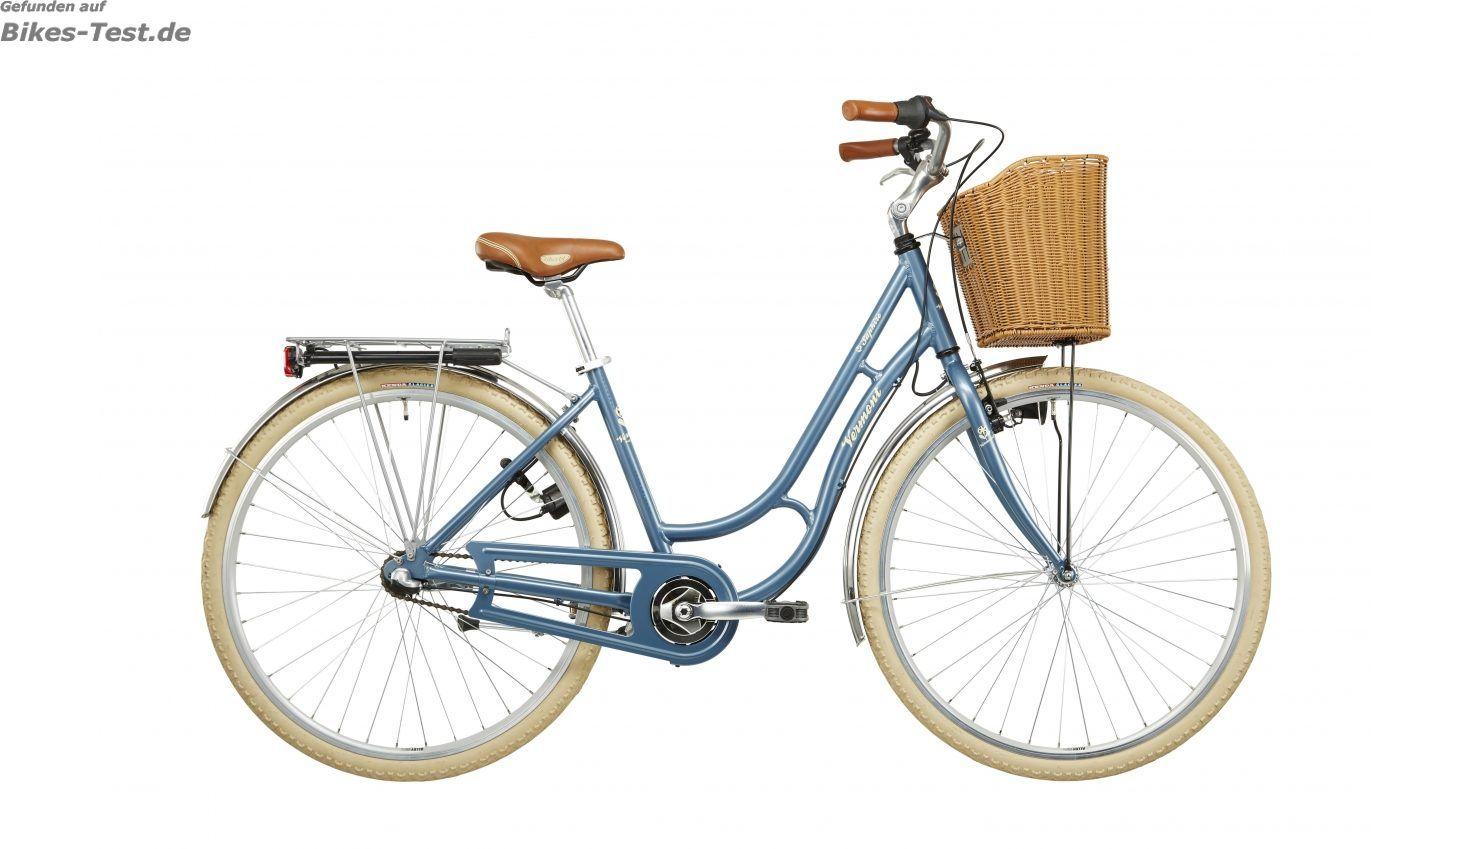 Cityrad Damenrad Shop Das Vermont Saphire 3 Gang Blau 2016 Citybike Damen Damen Fahrrad Mit Korb Hollandrad Damen